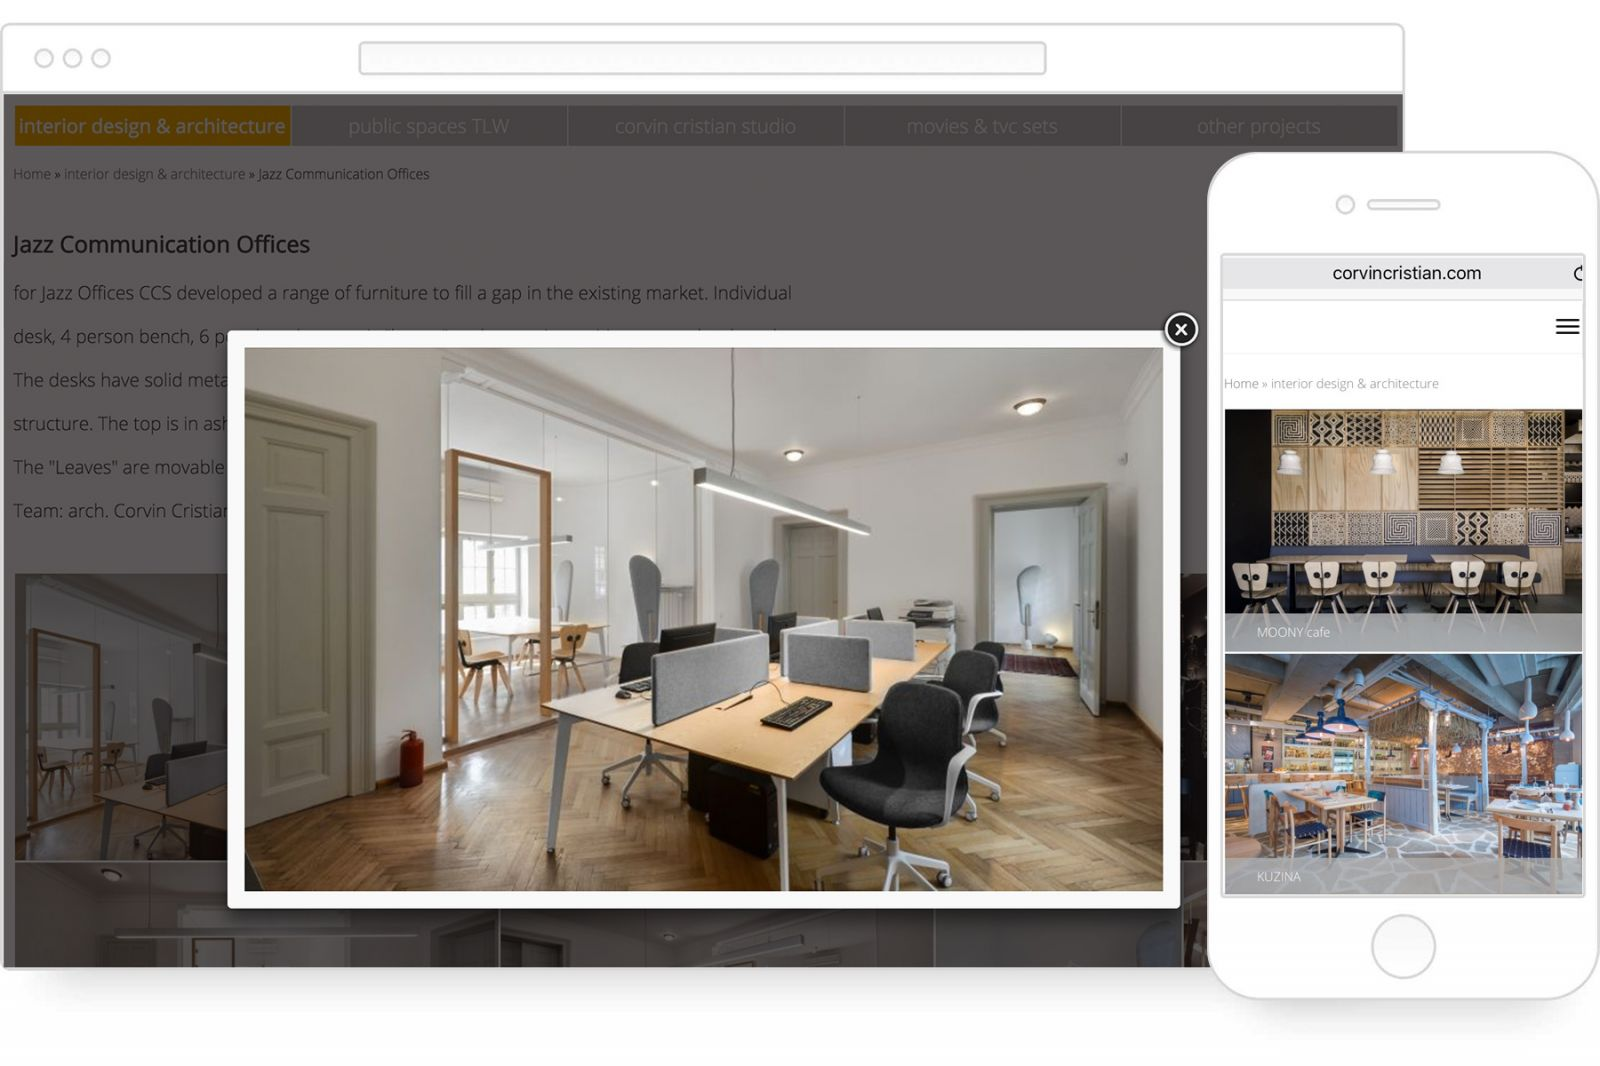 Corvin Cristian Studio - Architektur und Innenarchitektur